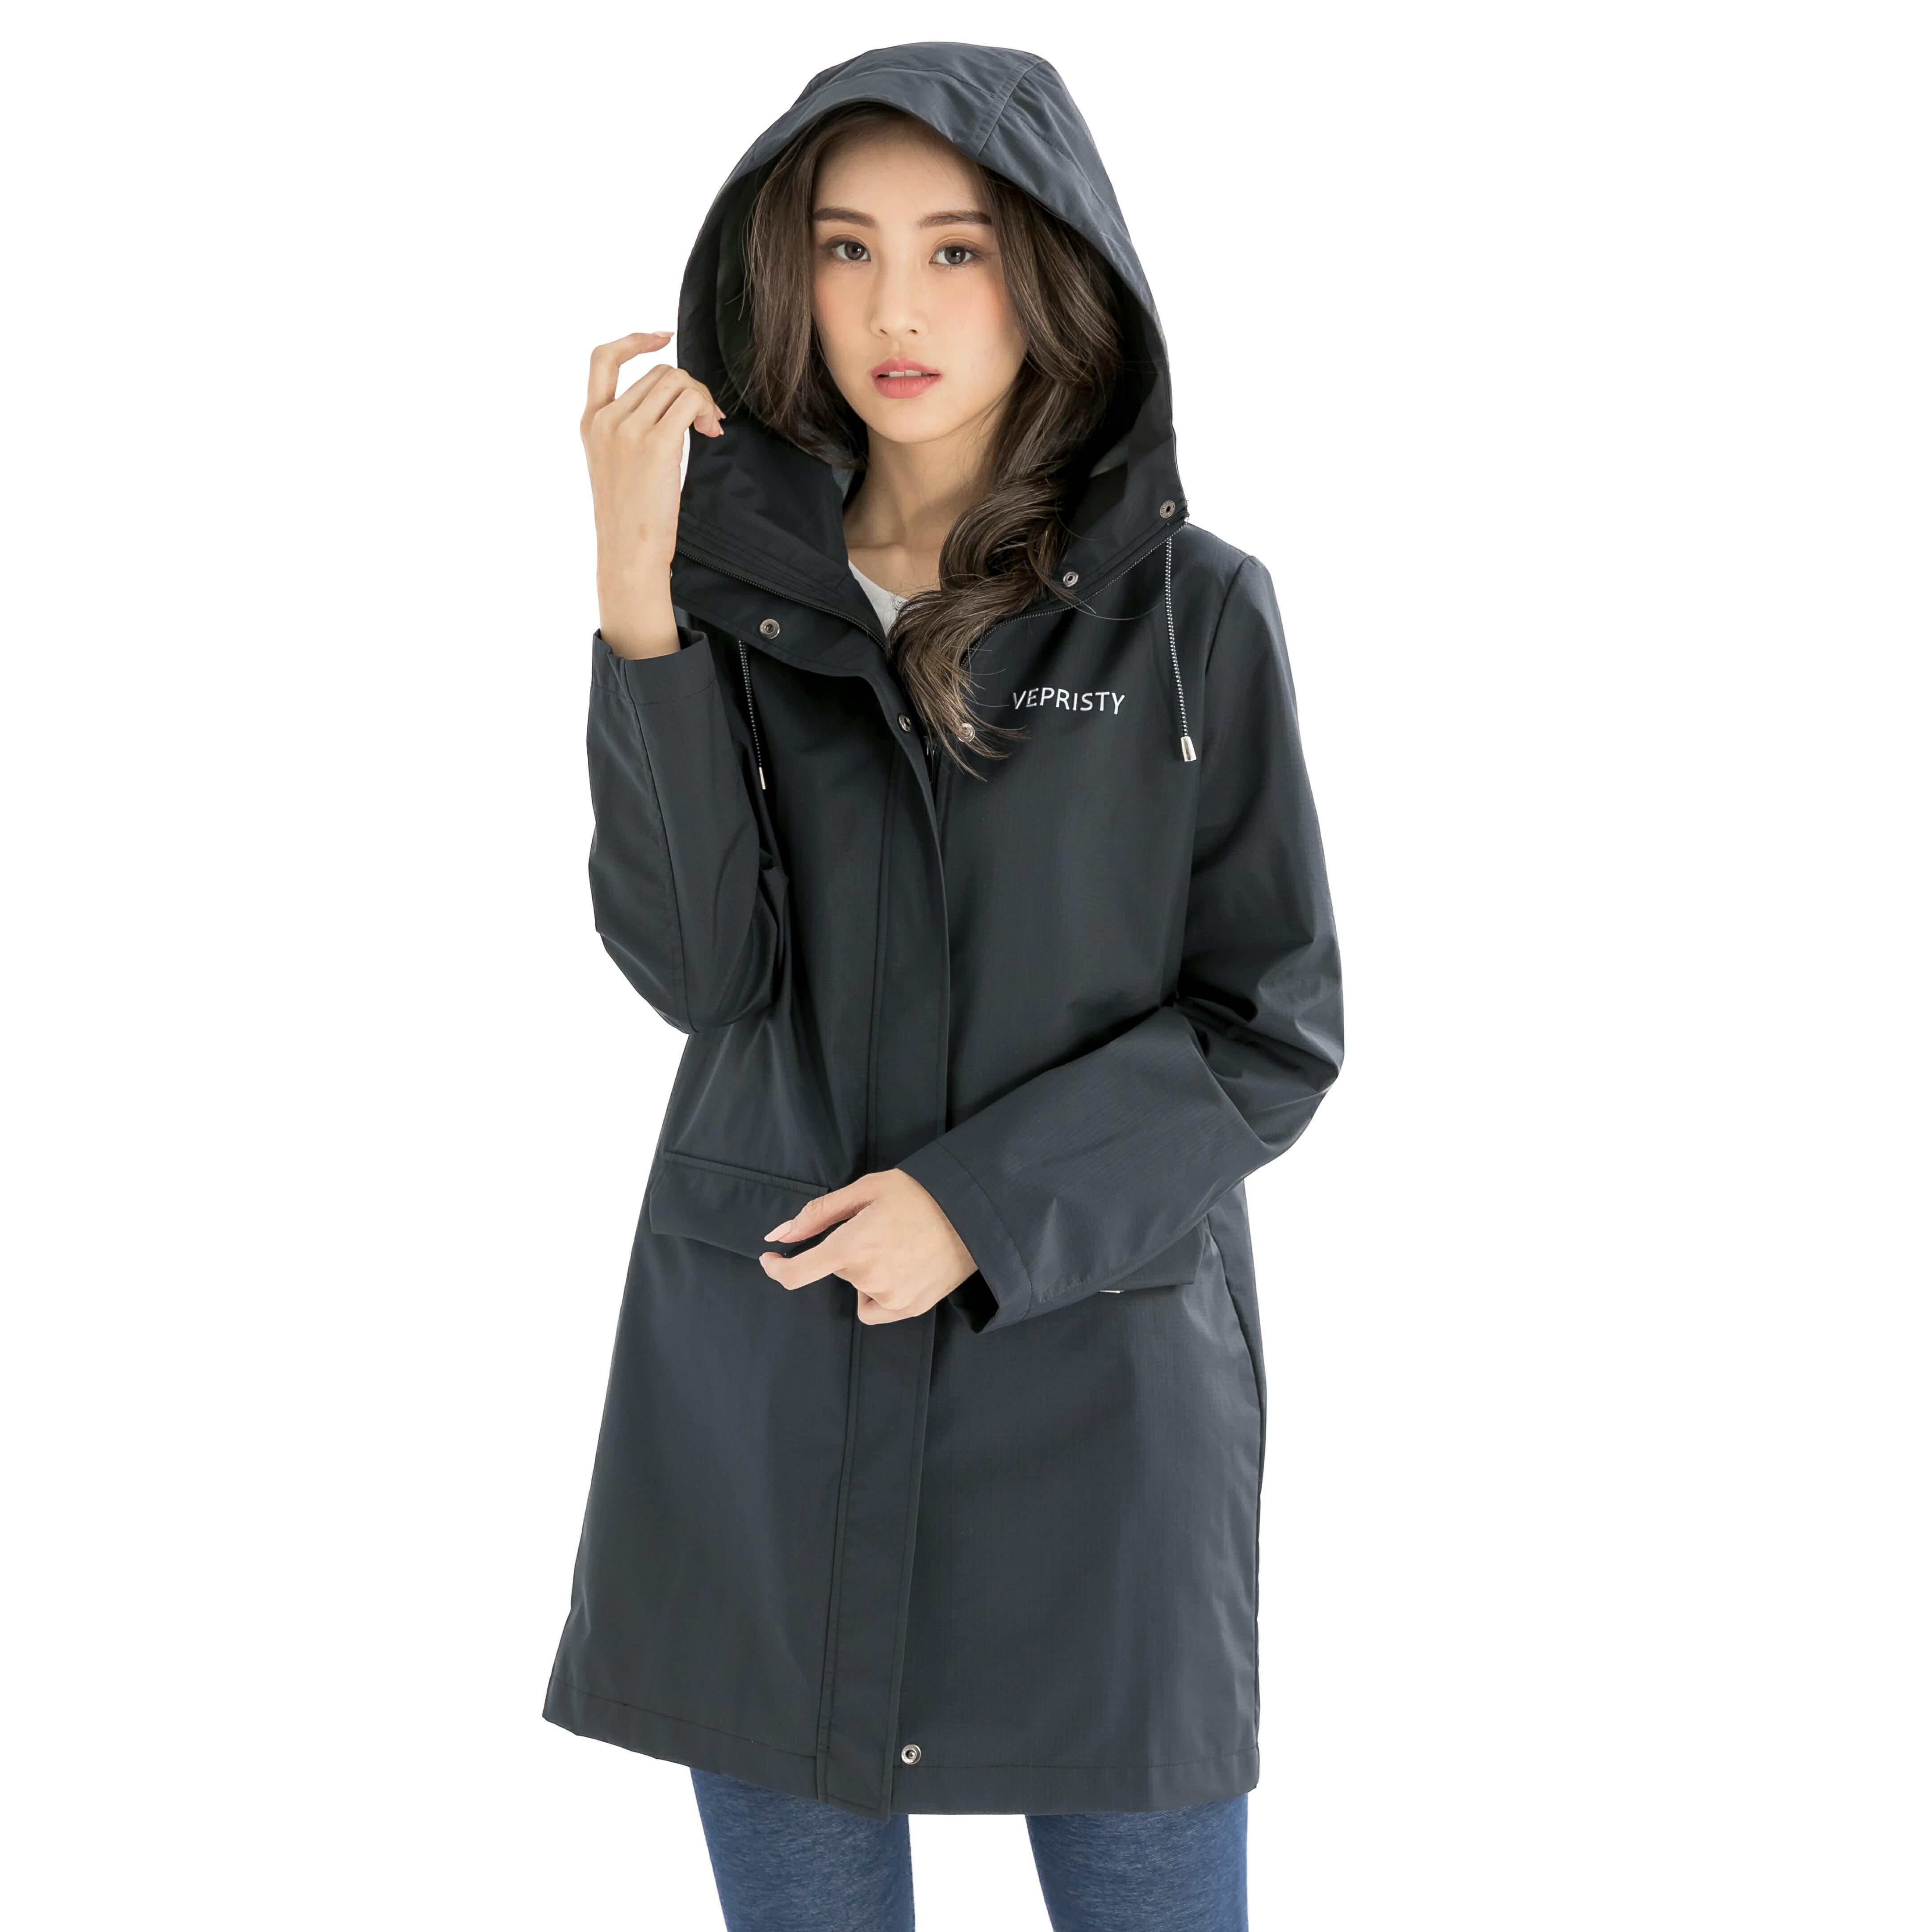 VEPRISTY gore-tex等級防水透氣風衣外套 (共3色)